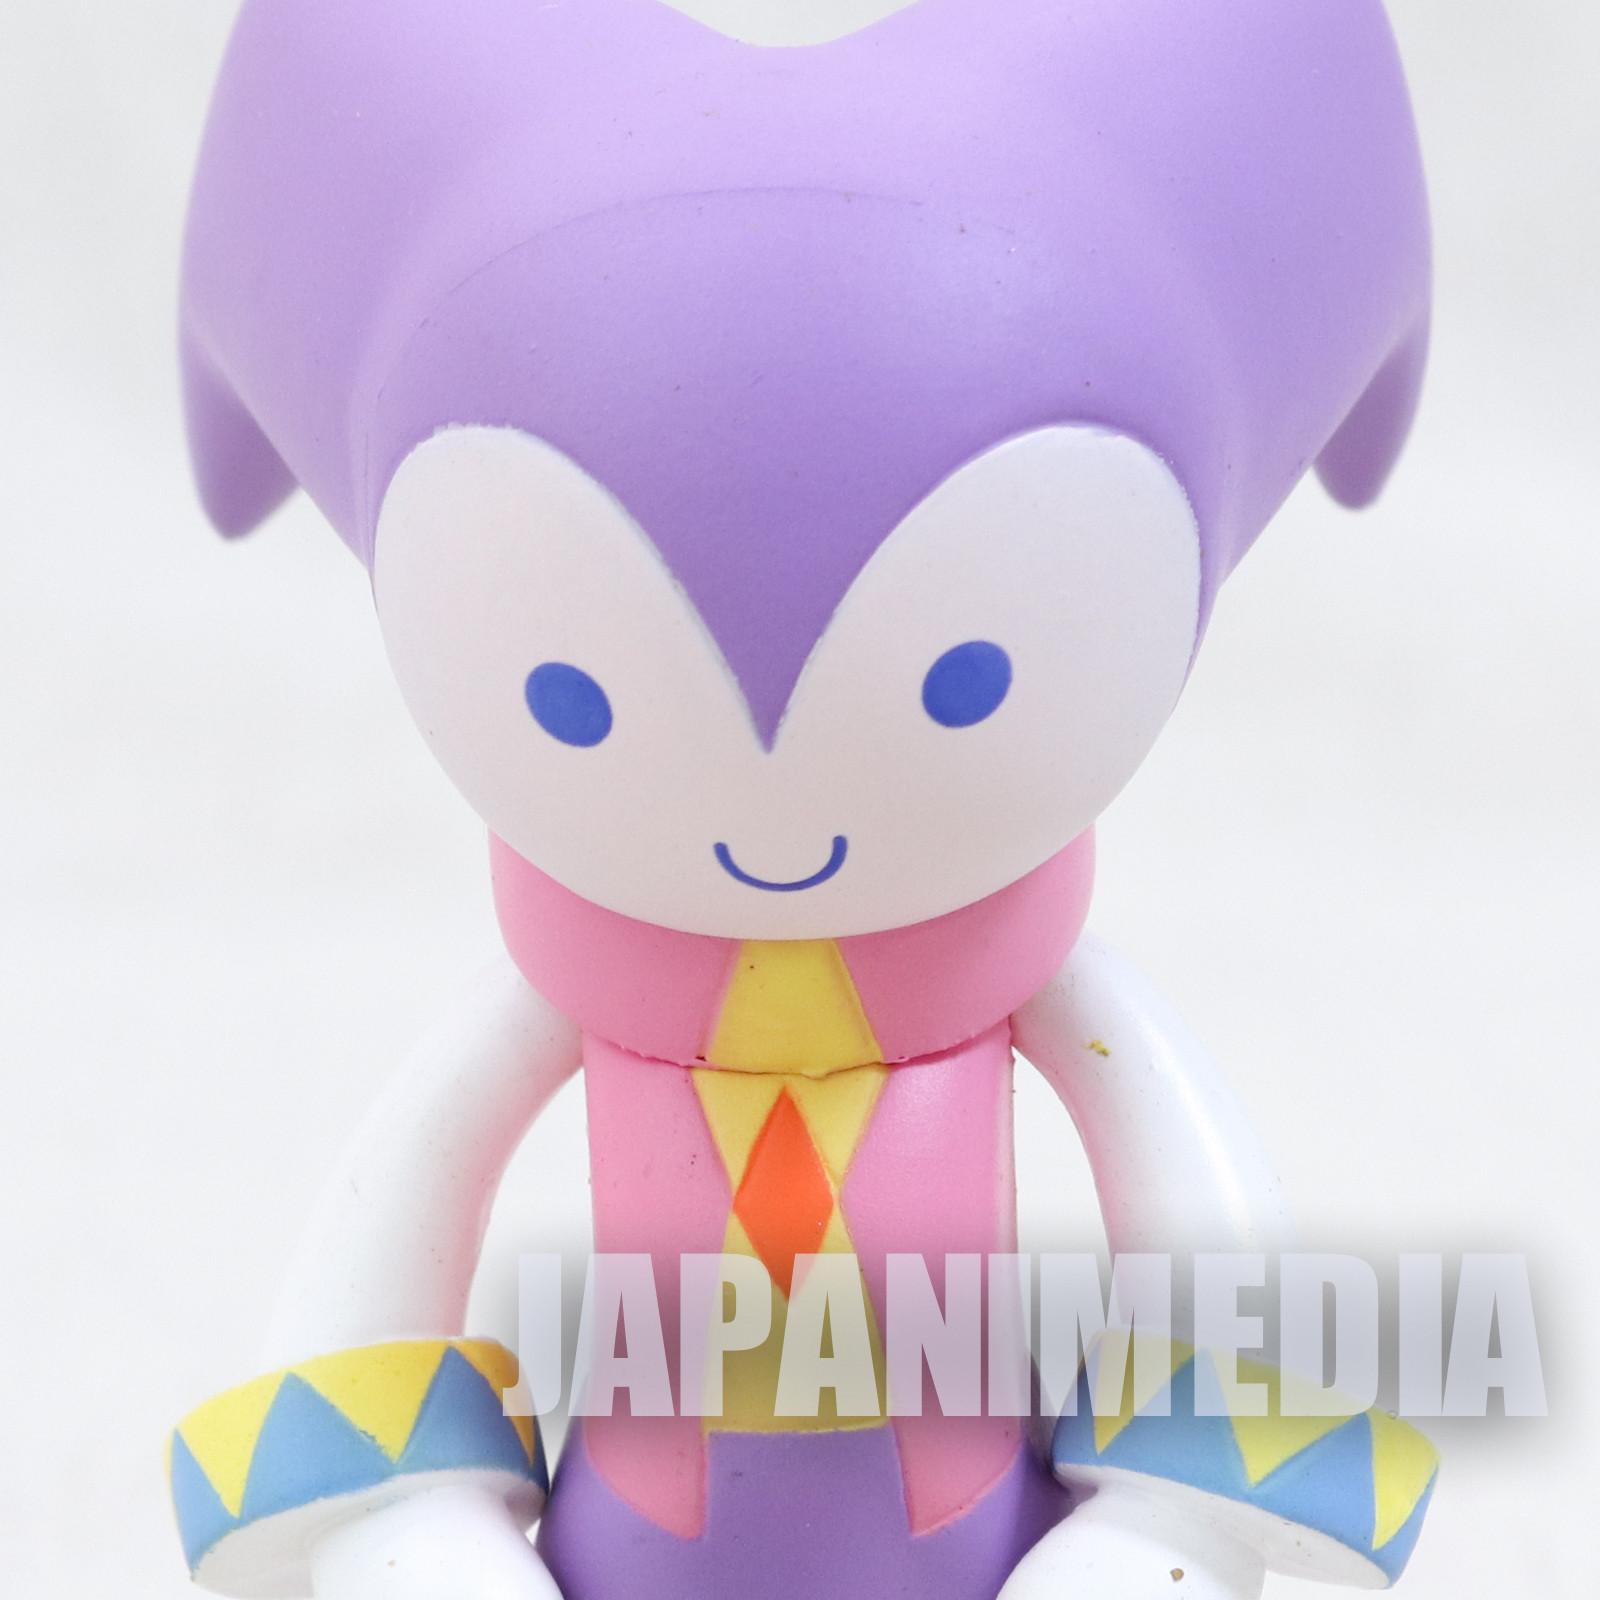 NiGHTS Jouney of Dreams PaPETCH : X001 Mini Figure SEGA Wii (No Box)